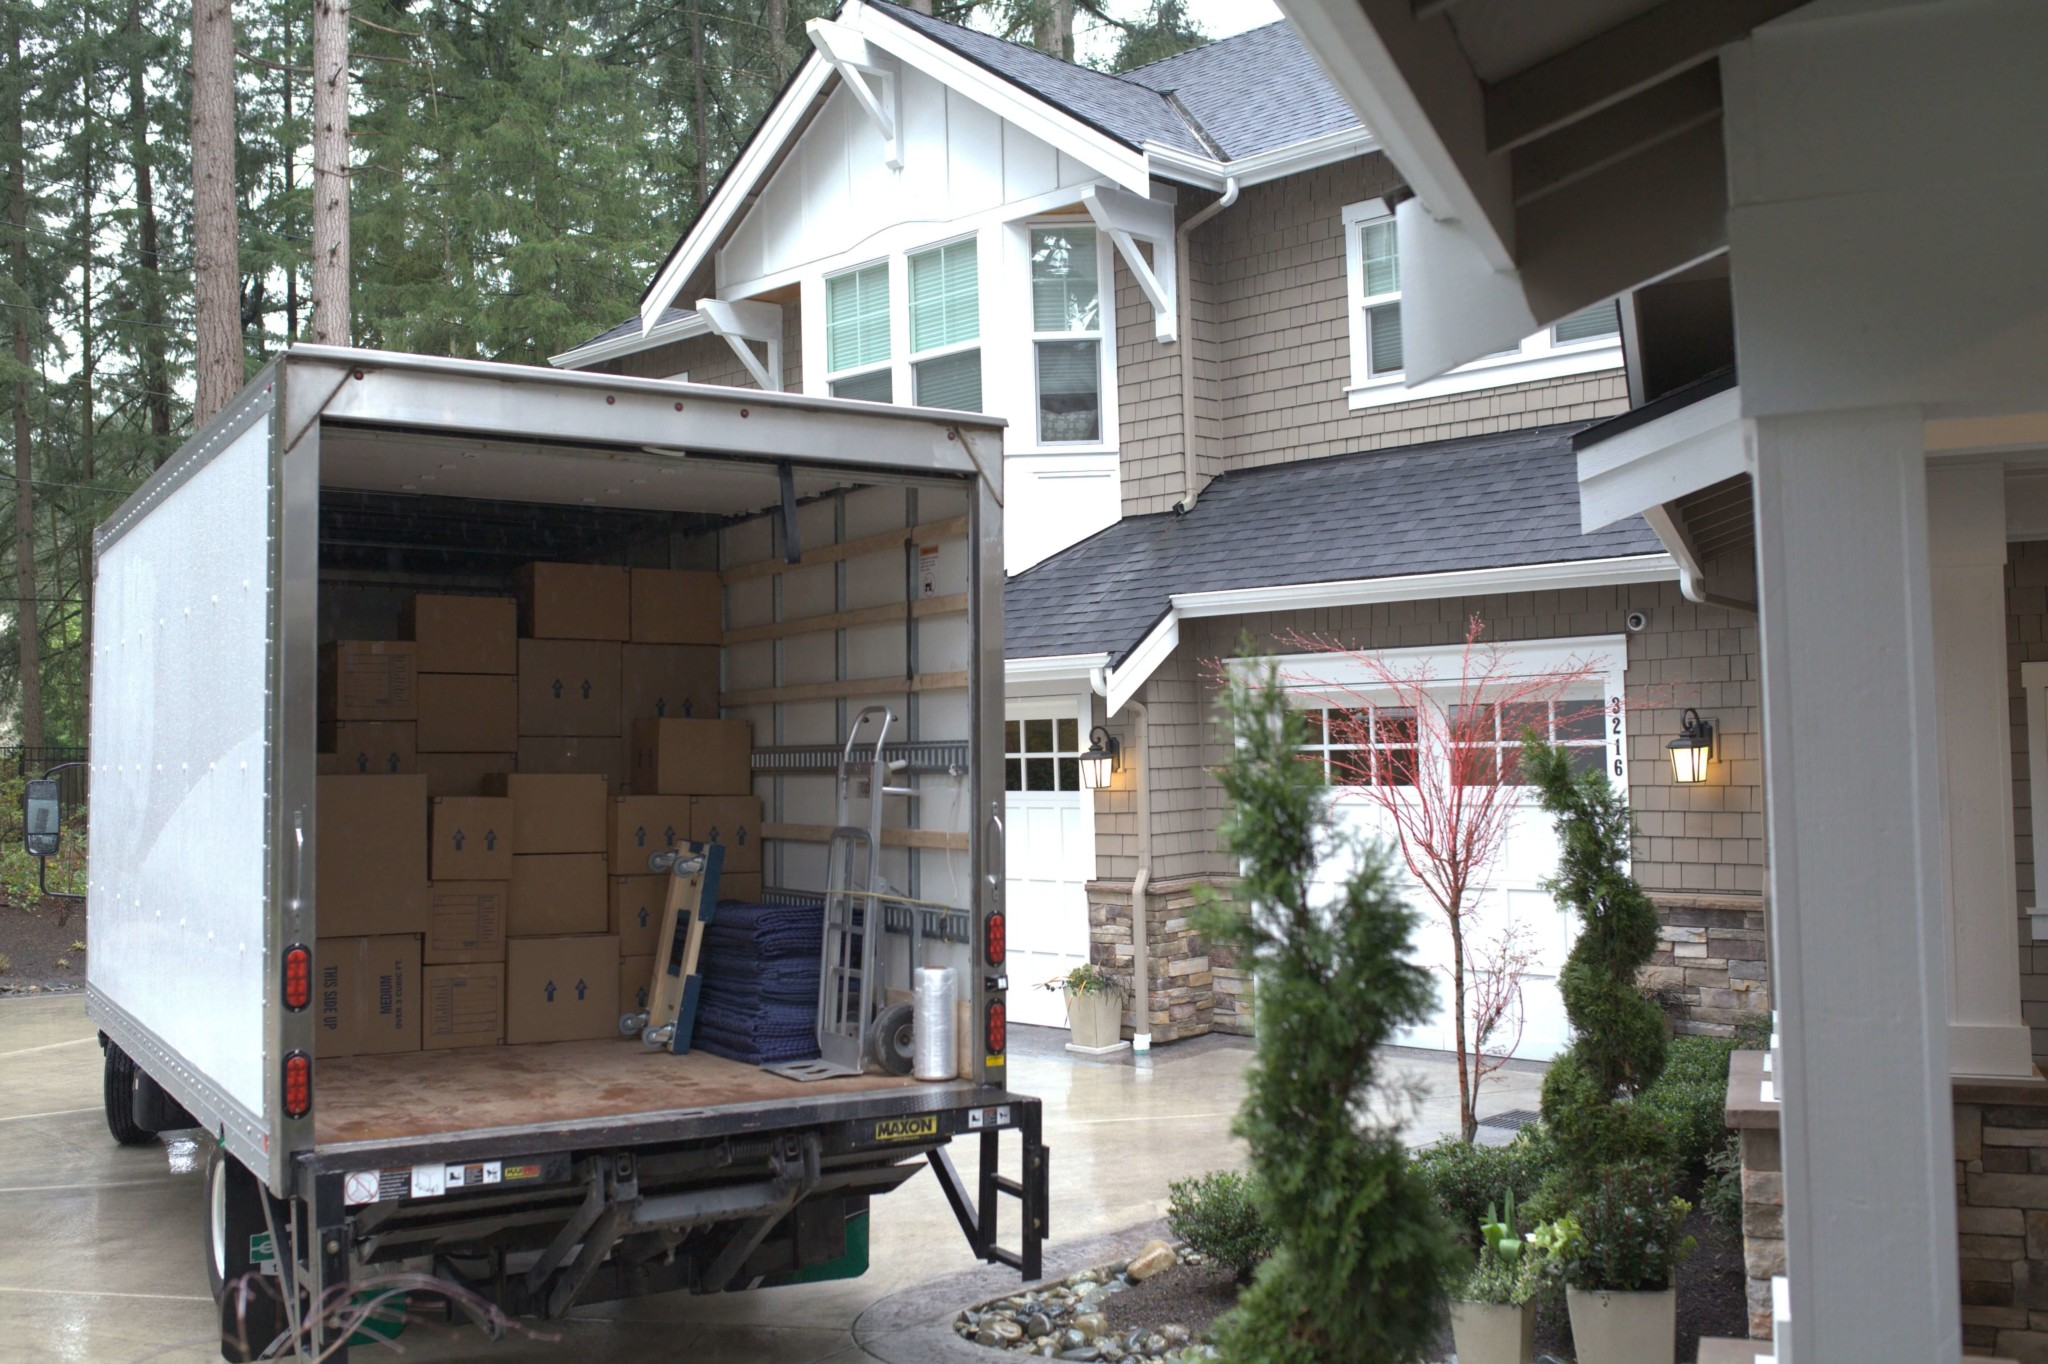 Moving company in Lynnwood